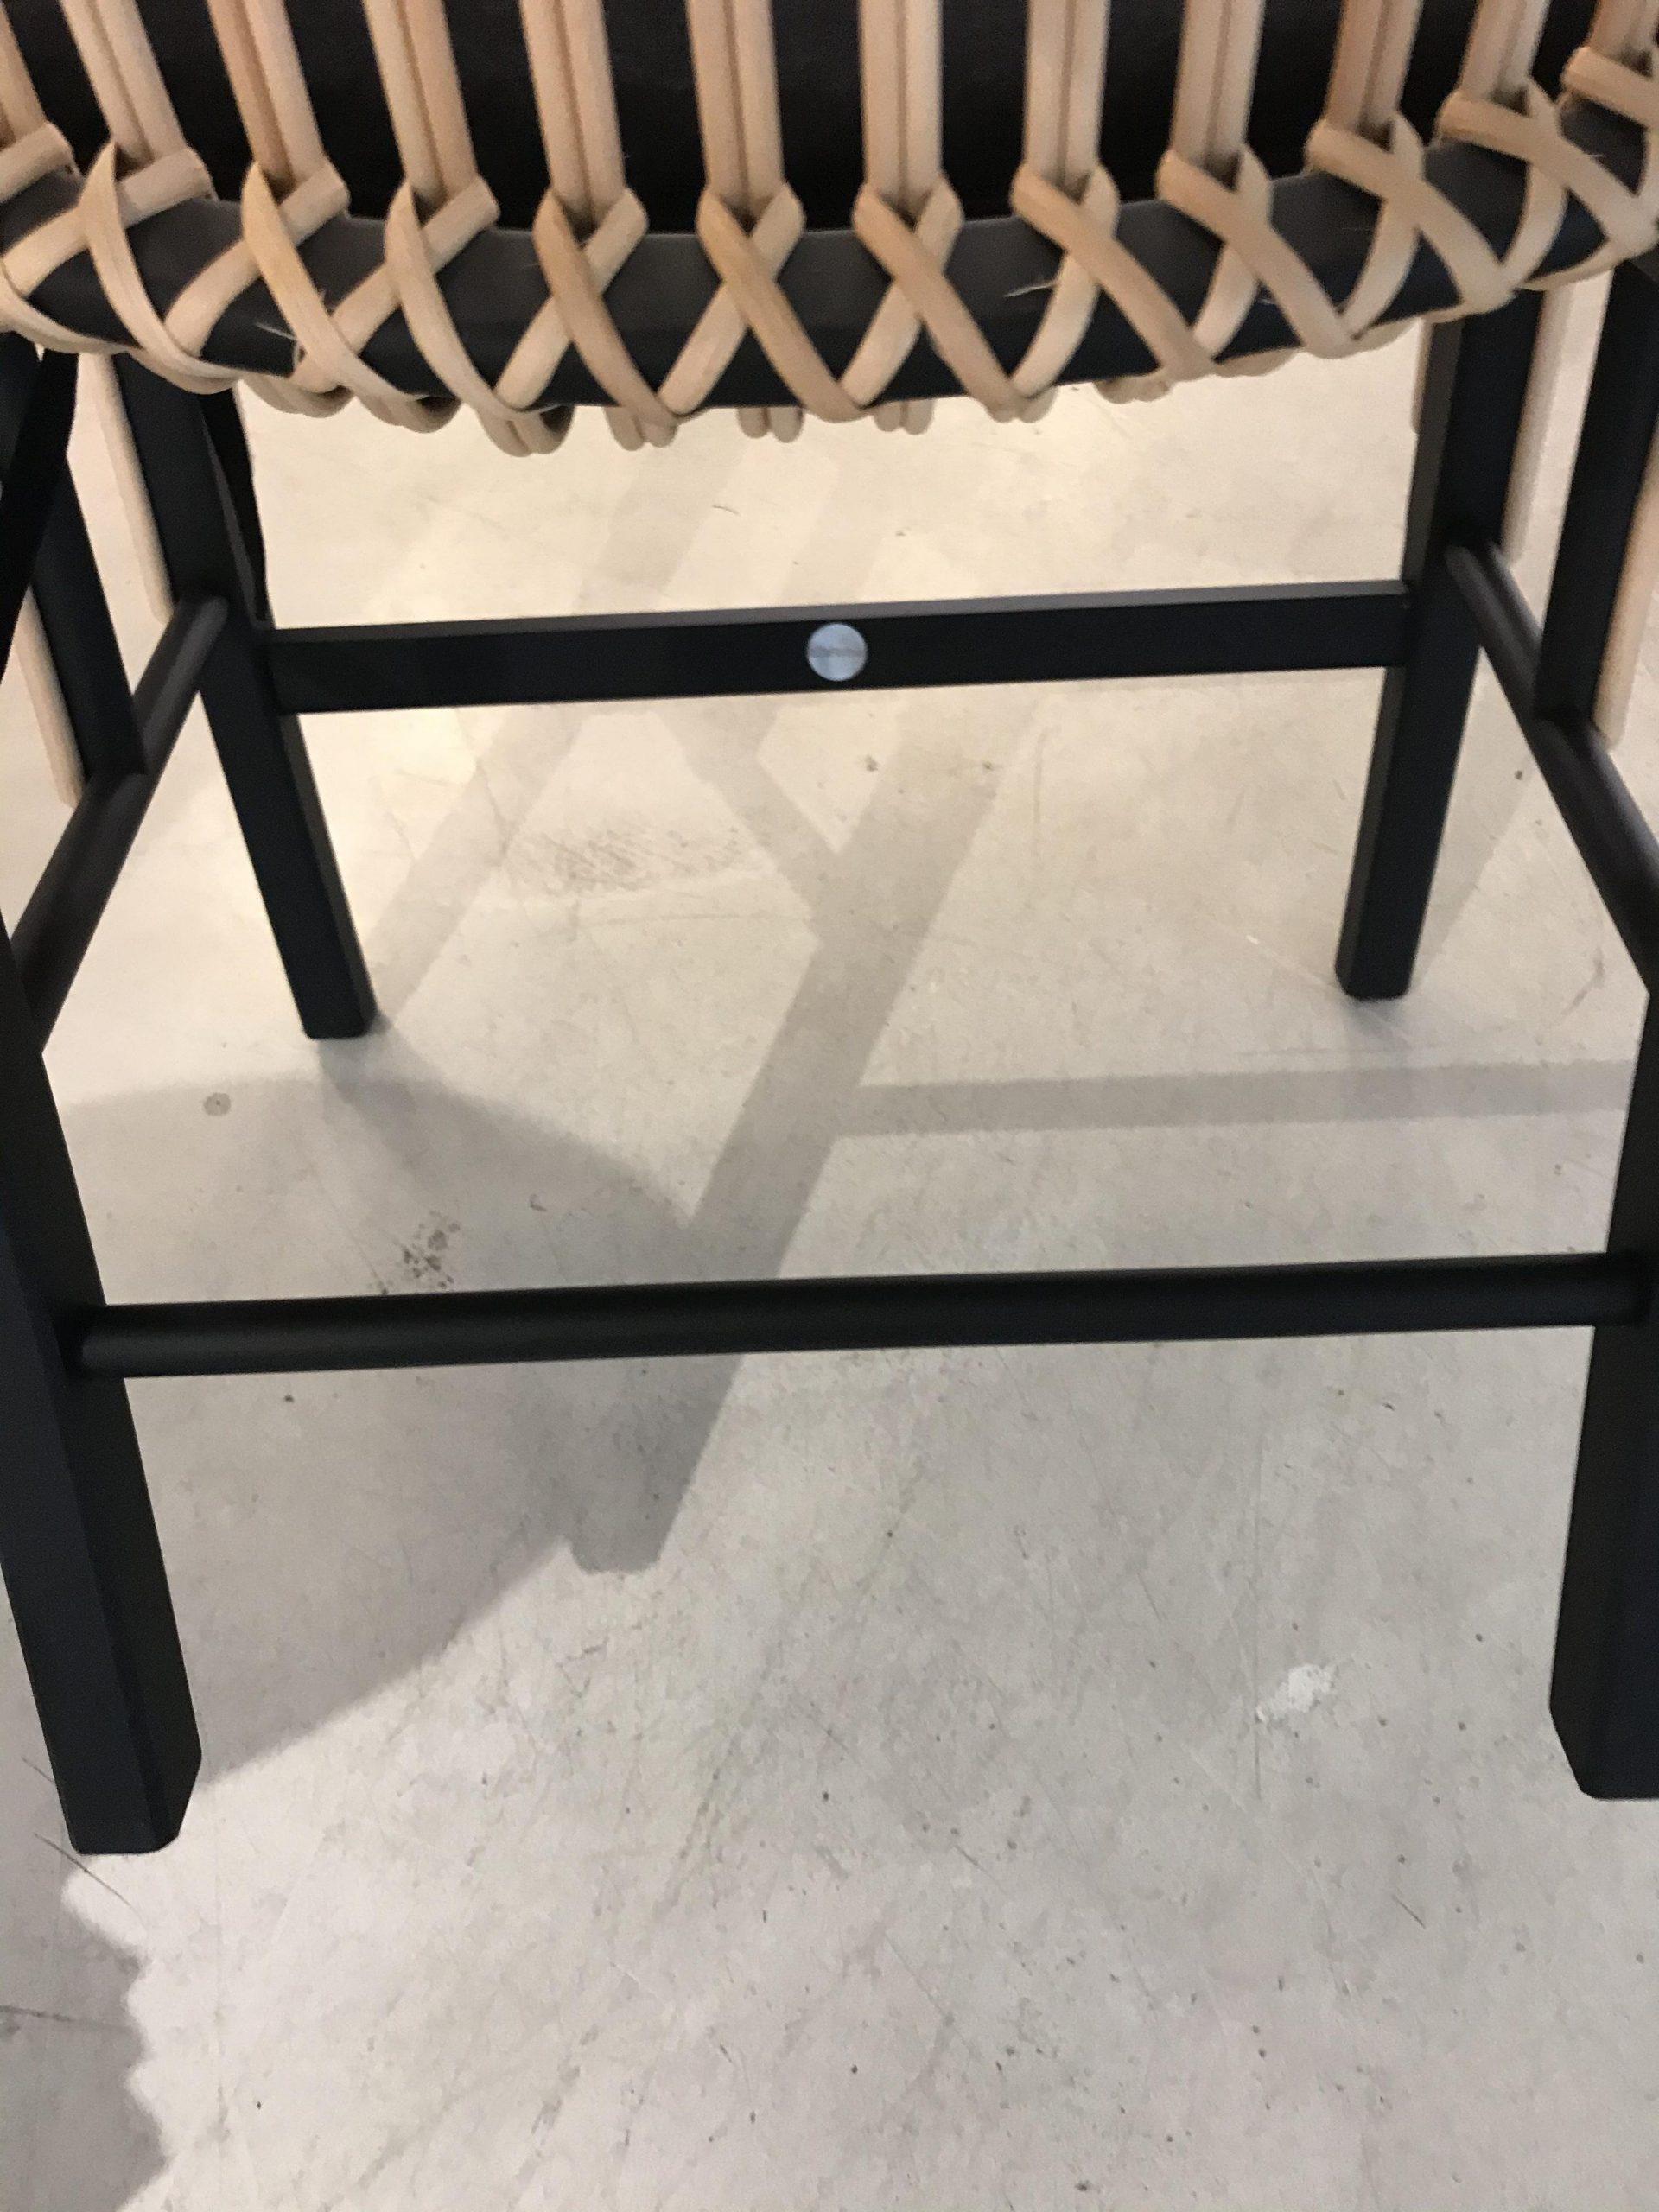 URAGANO Vico Magistretti De Padova原创椅子设计意大利制造